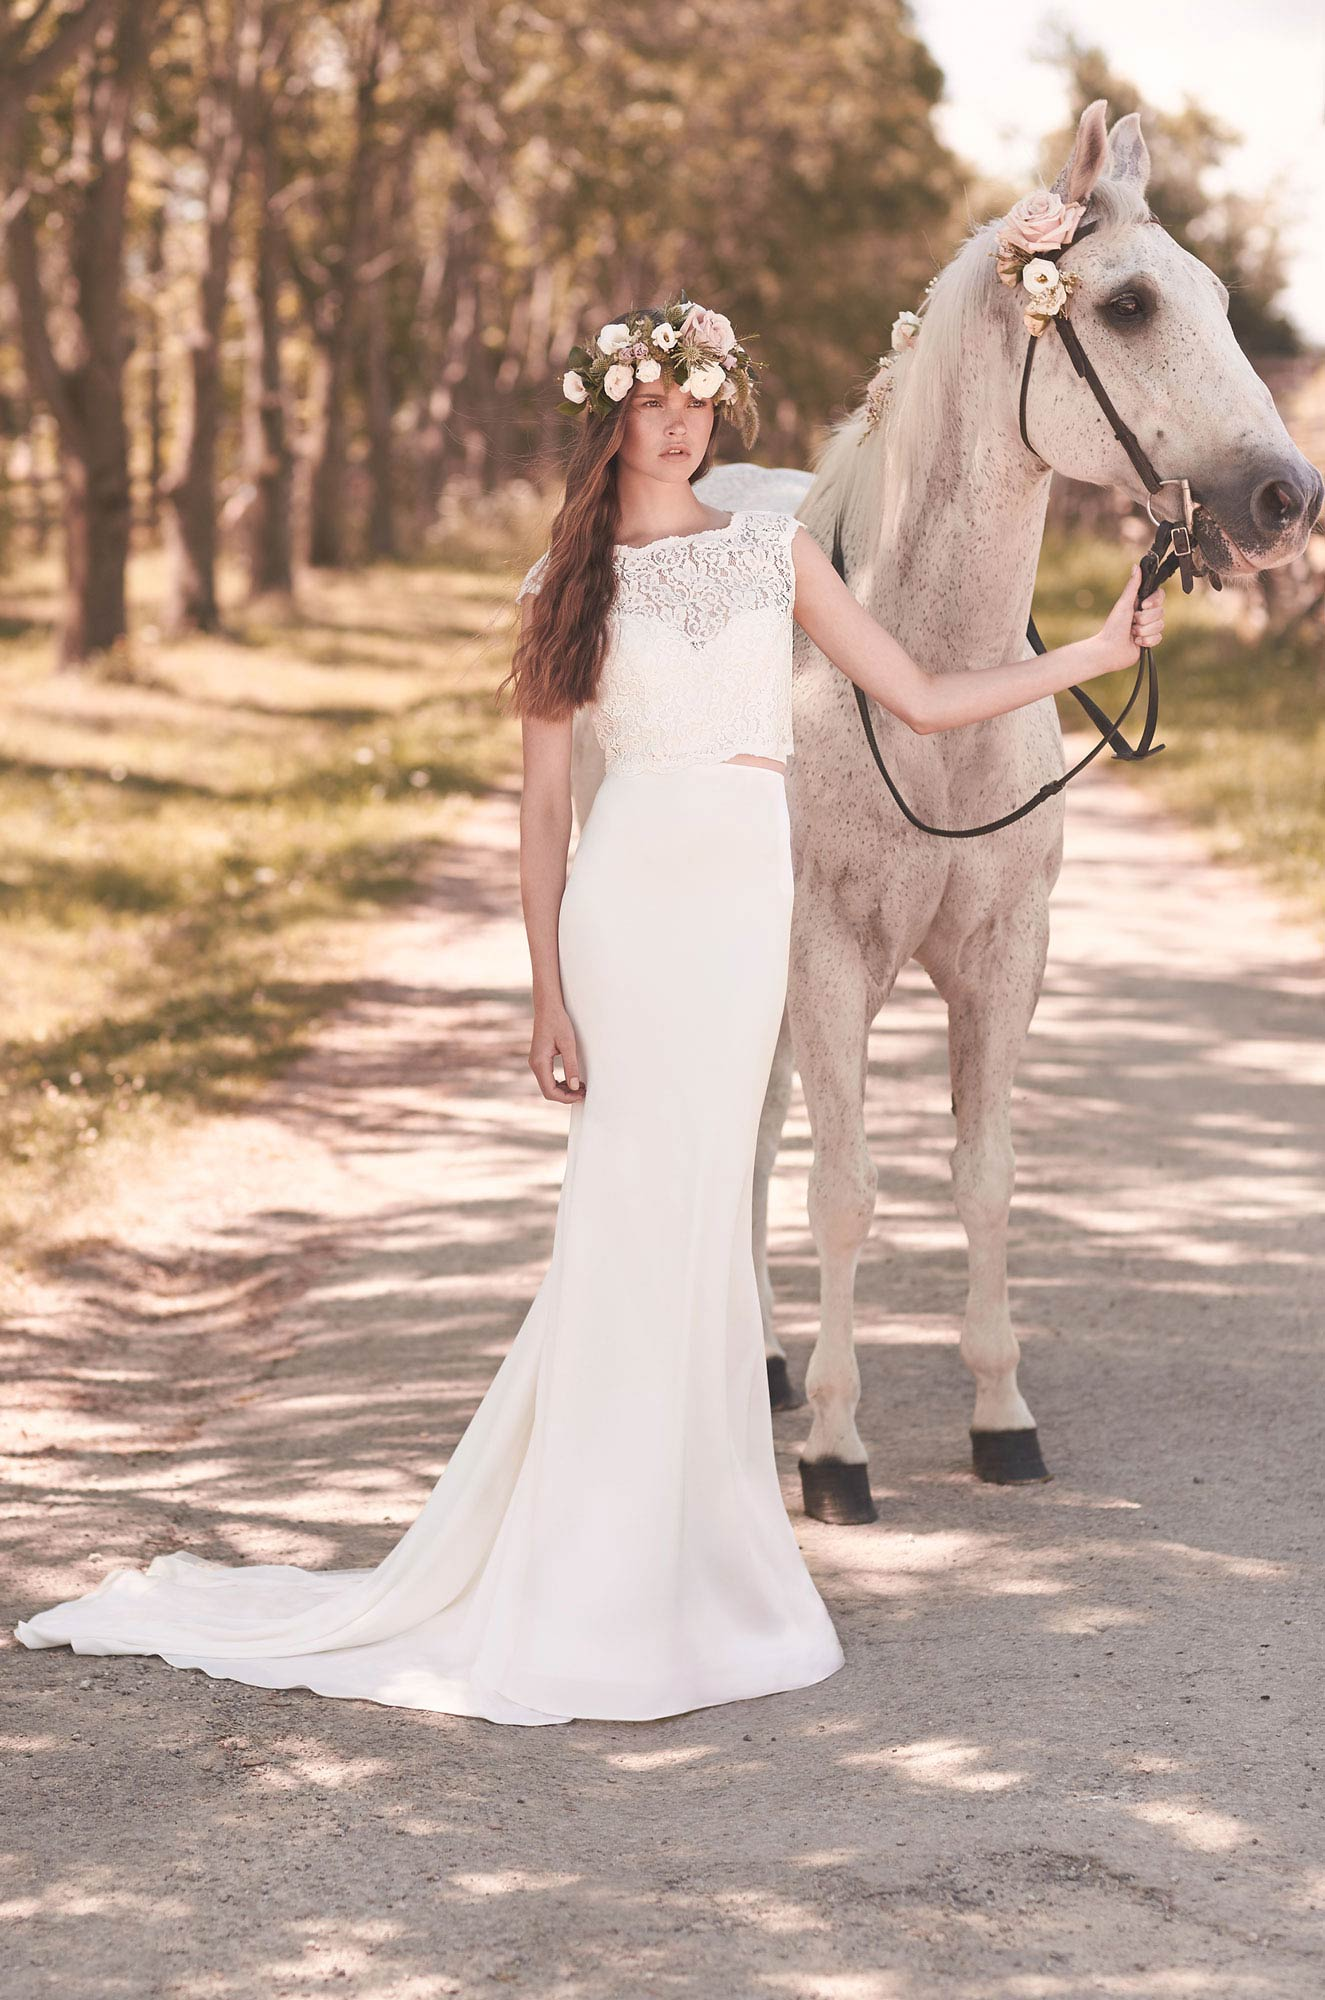 Crop Top Wedding Dress - Style #2053 | Mikaella Bridal